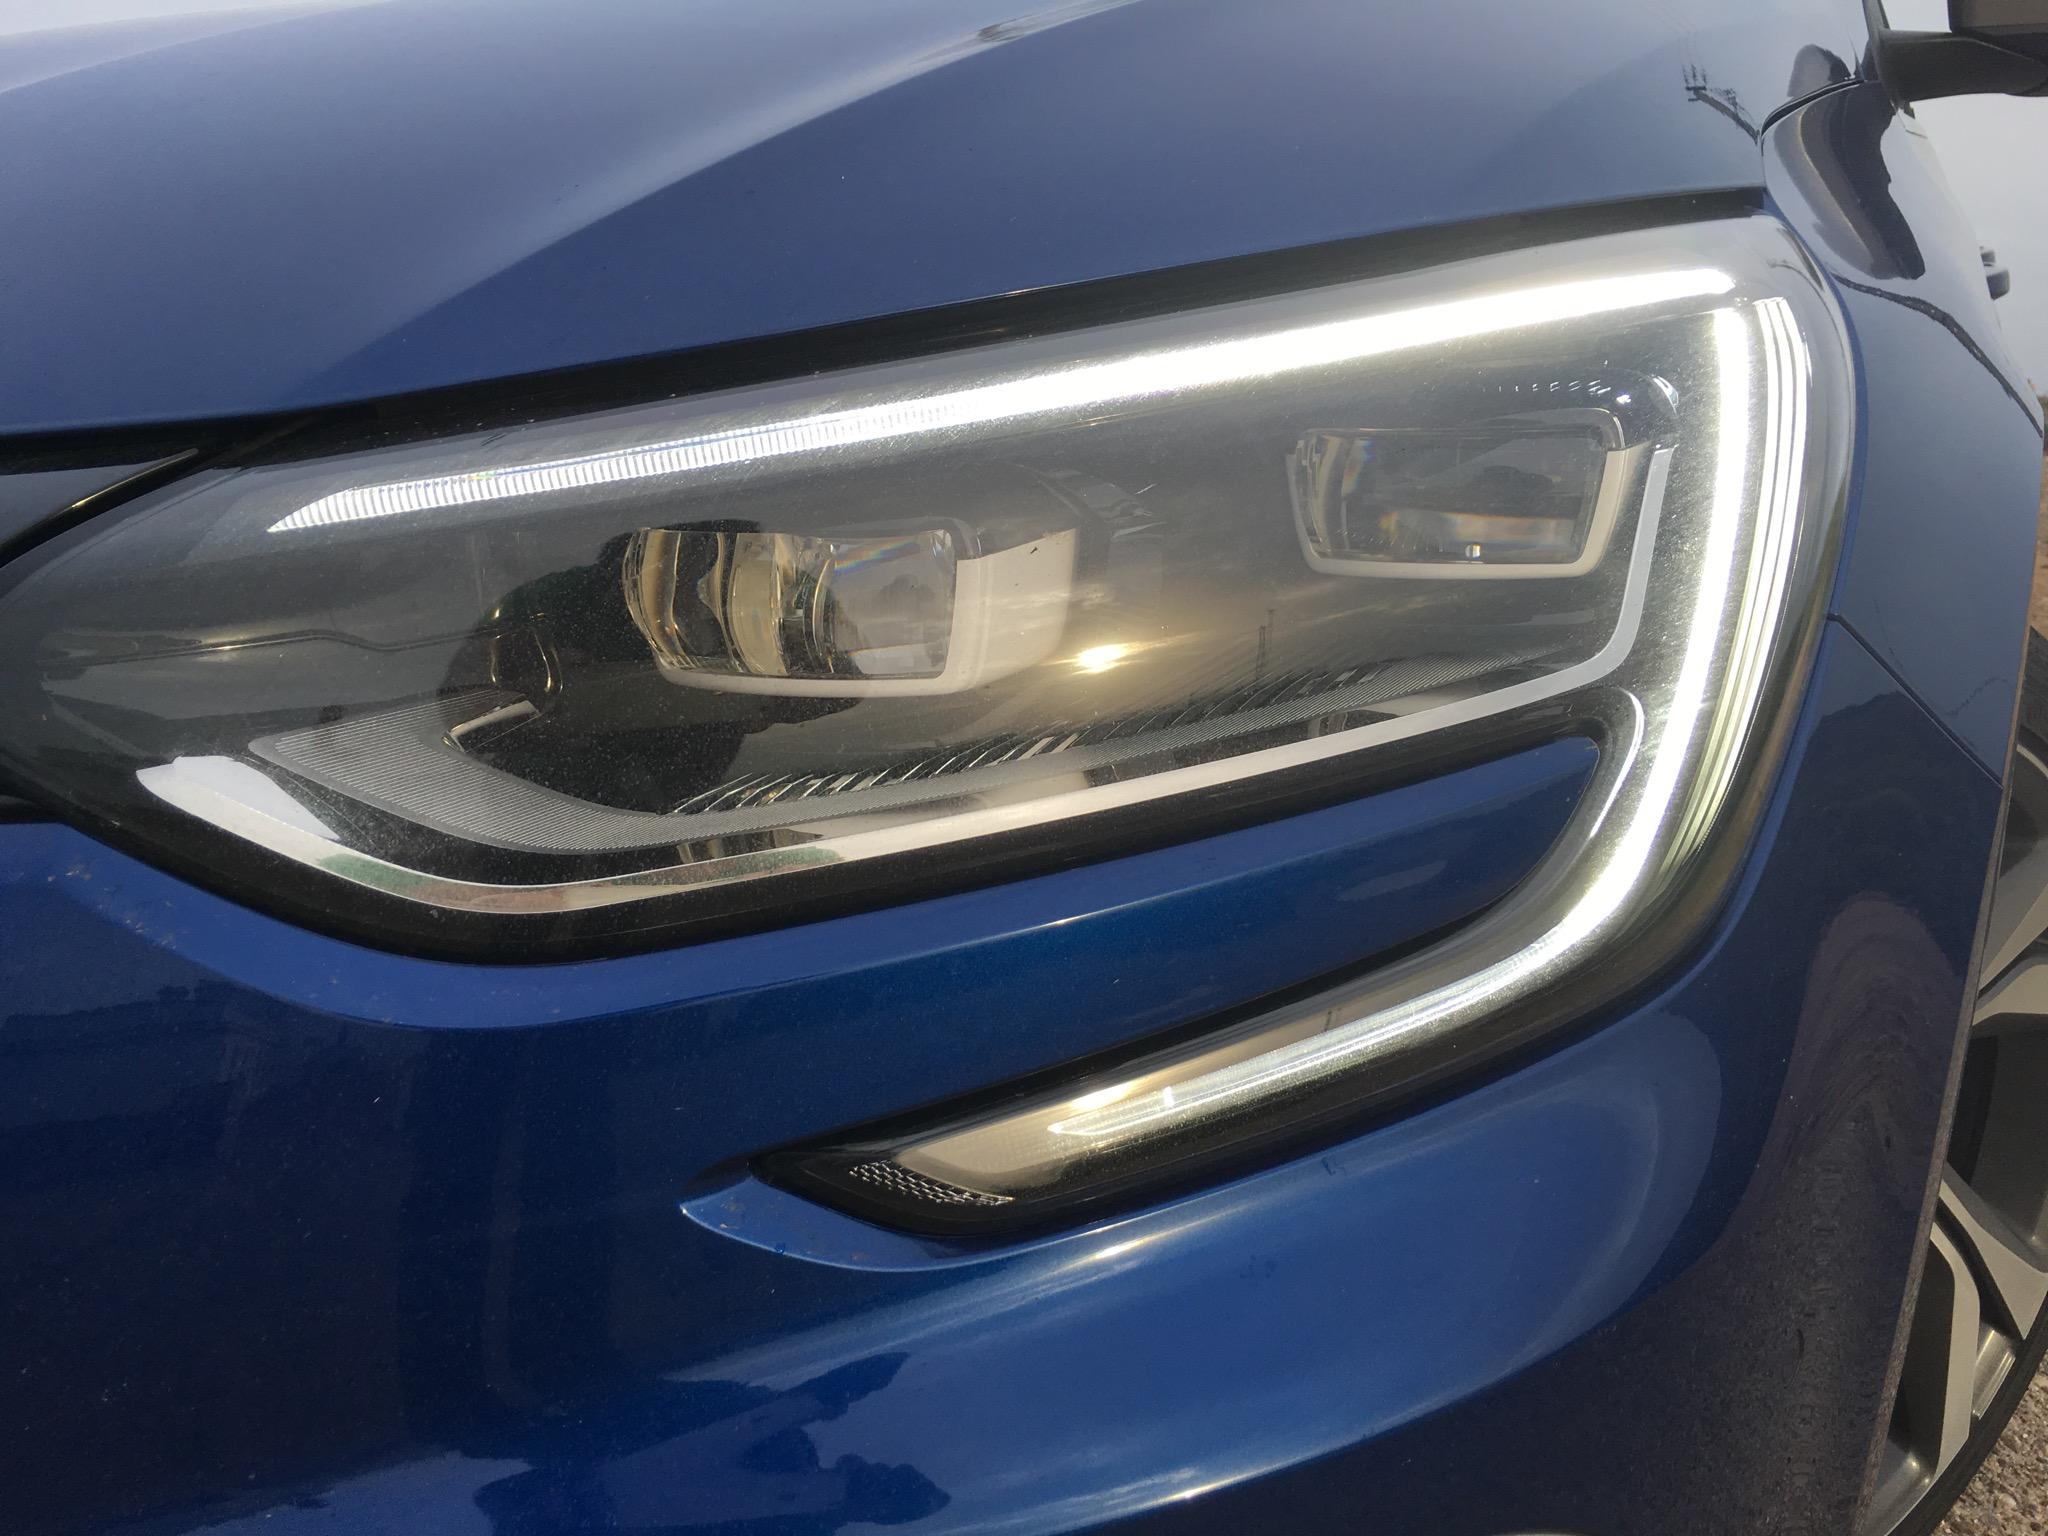 Renault Megane GT Headlight